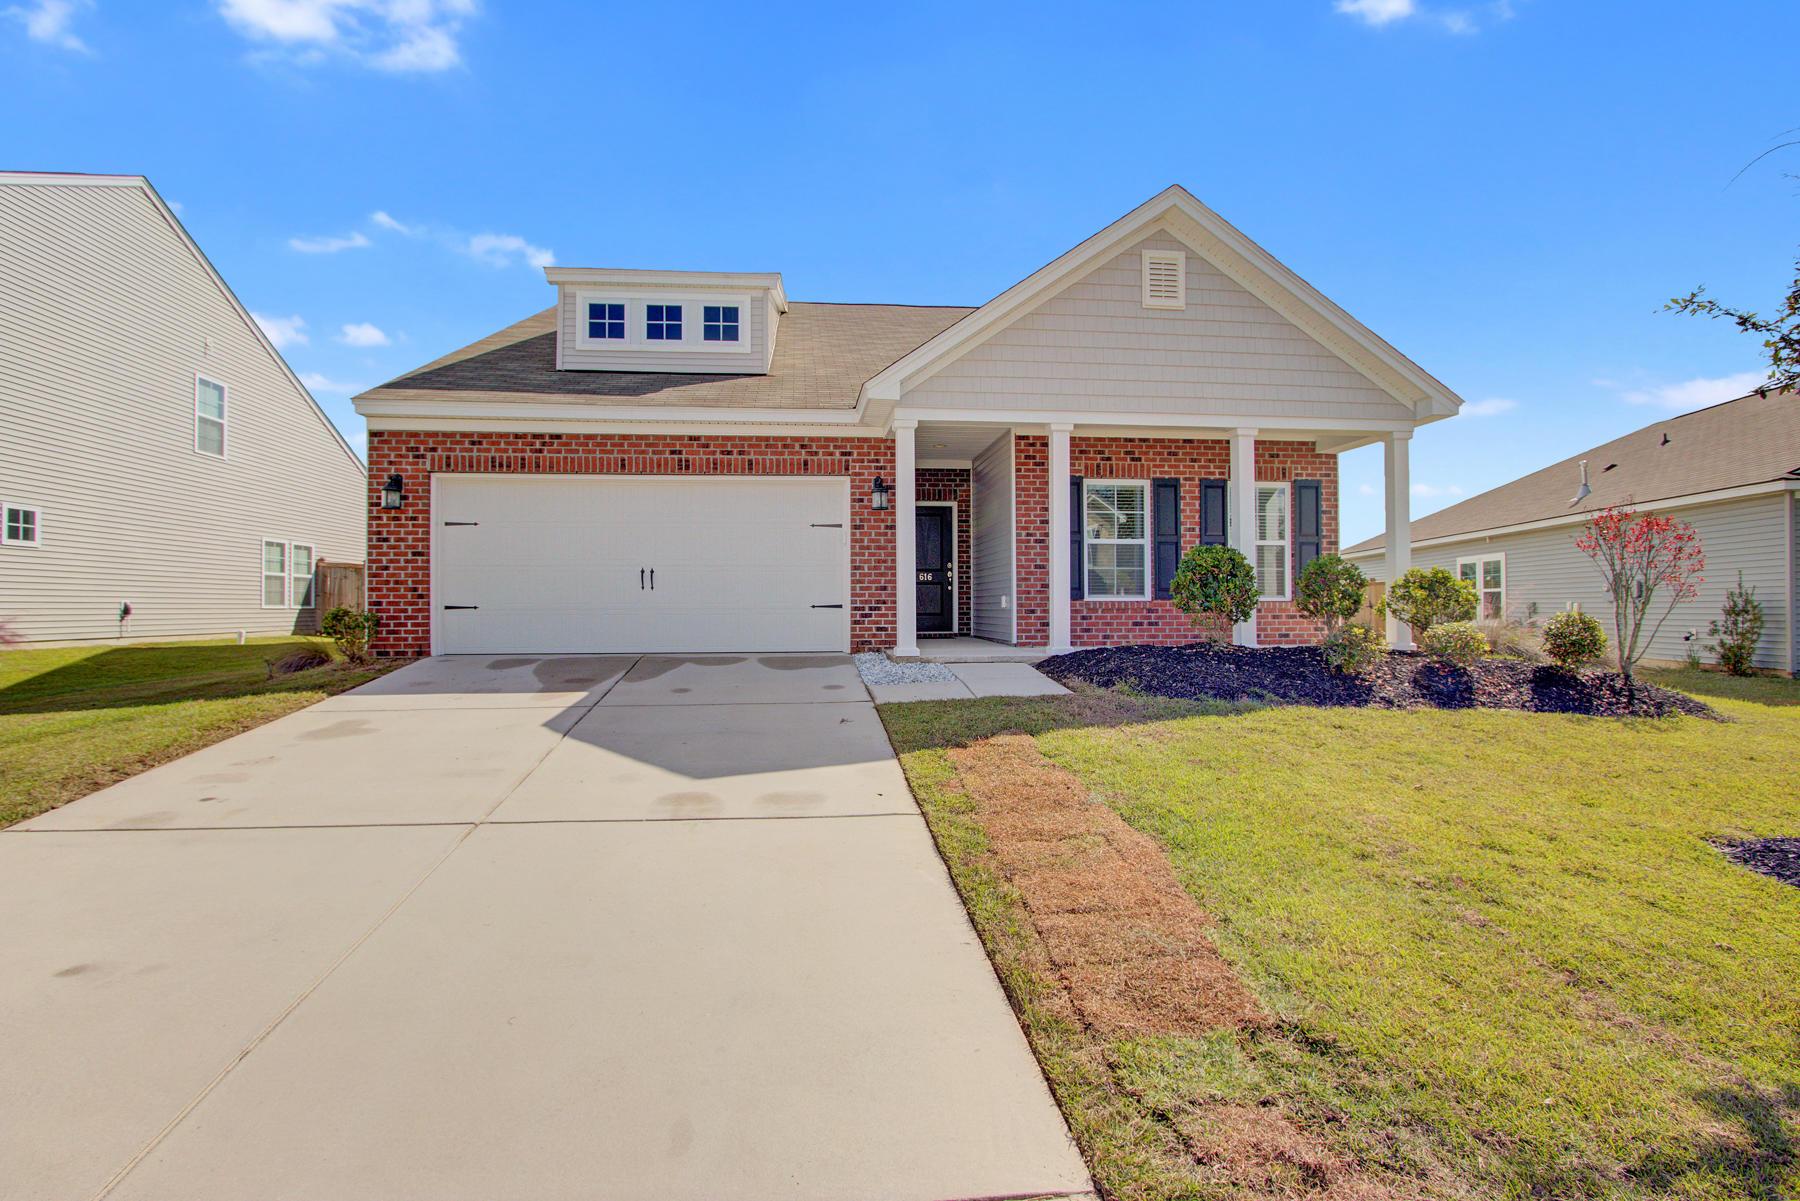 Brickhope Plantation Homes For Sale - 616 Zinnia, Goose Creek, SC - 36